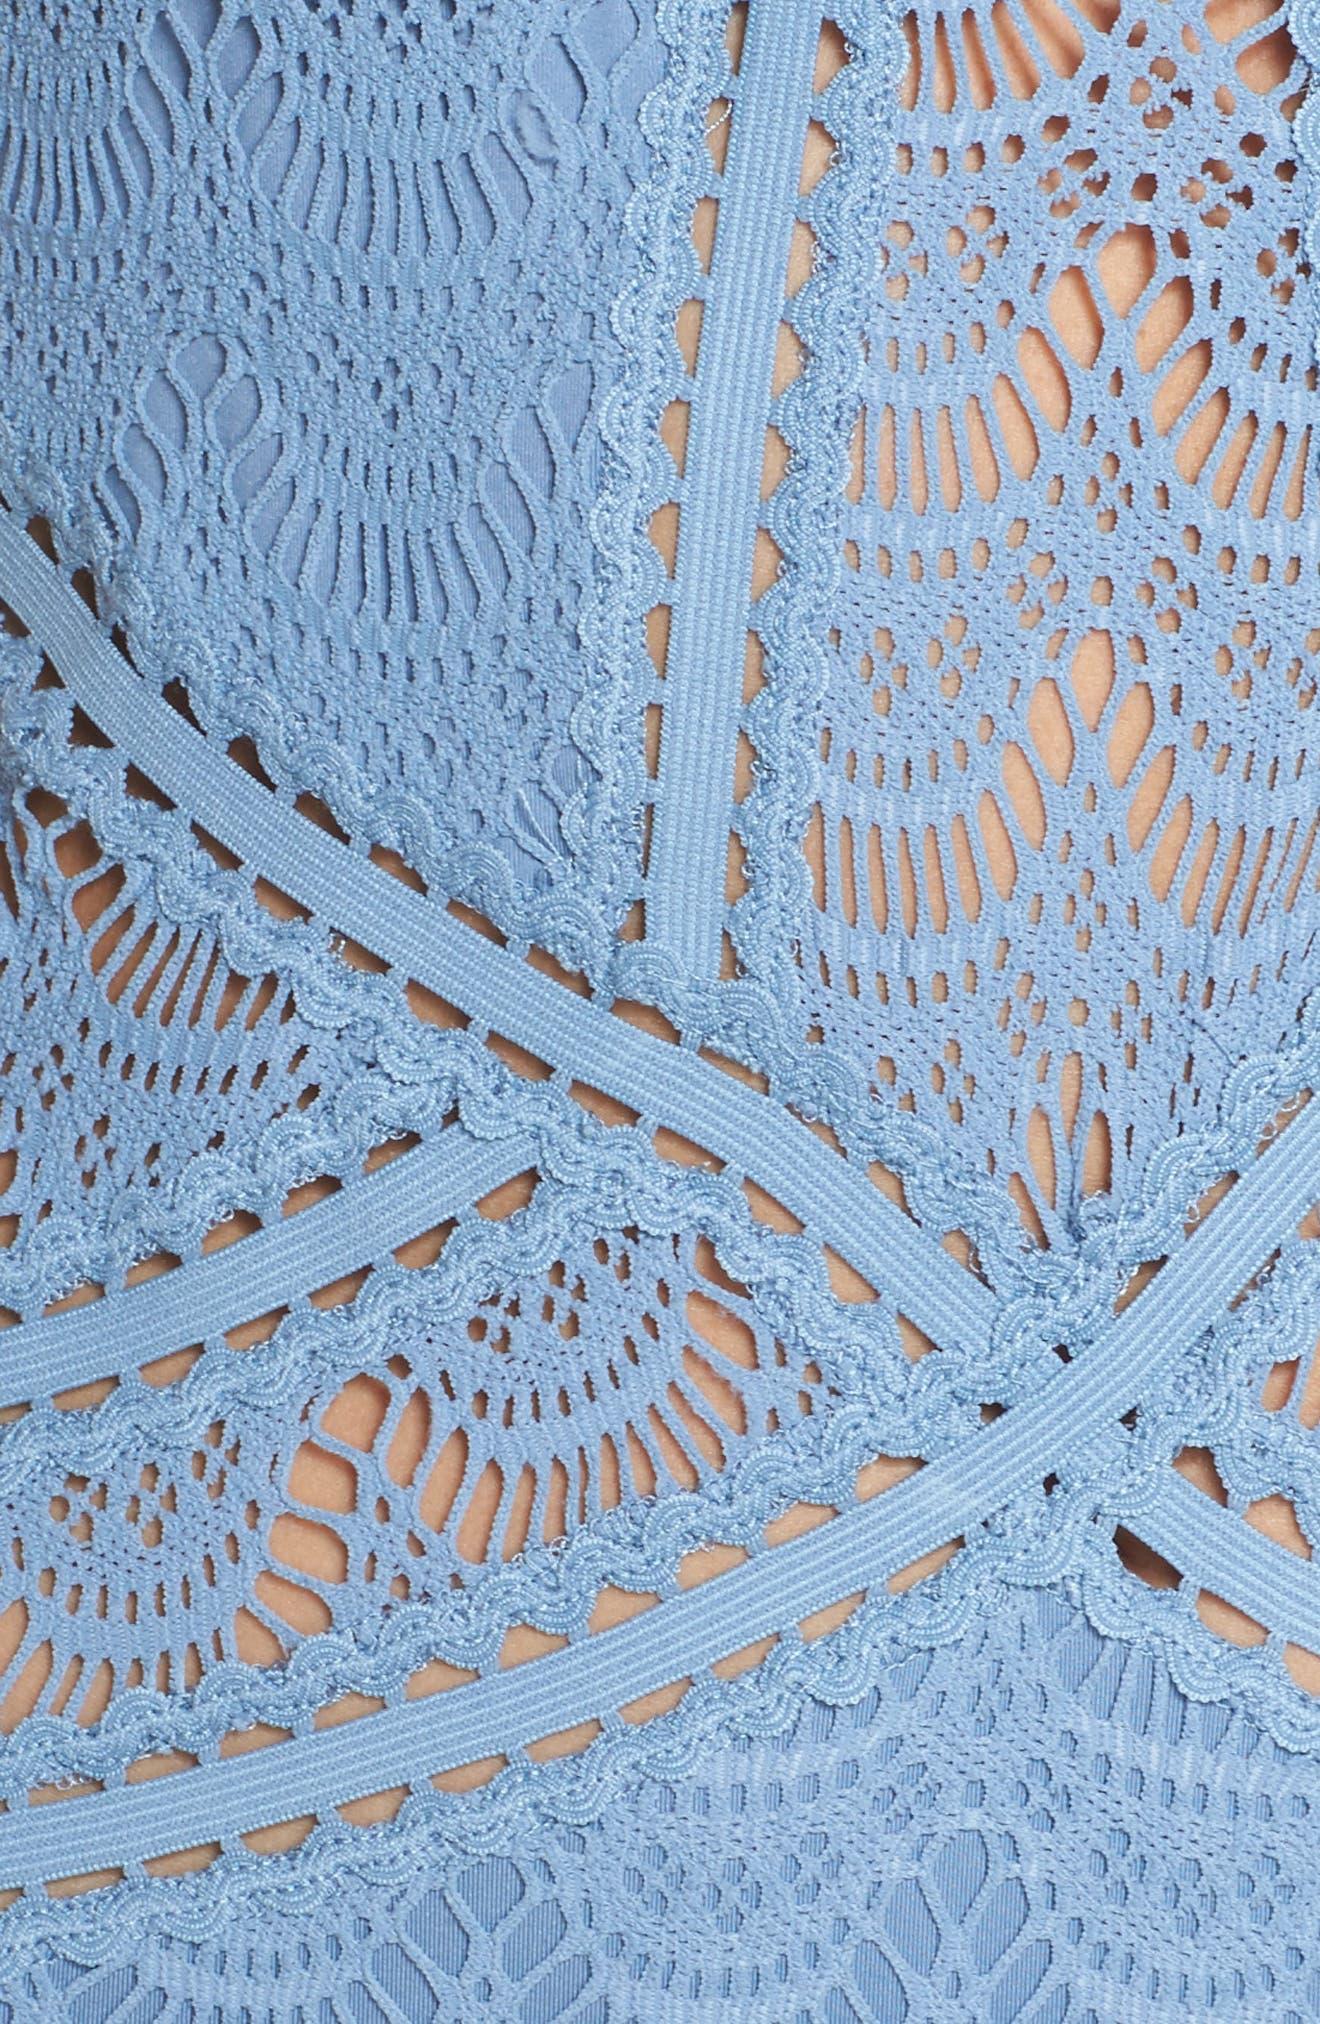 Crochet One-Piece Swimsuit,                             Alternate thumbnail 5, color,                             Steel